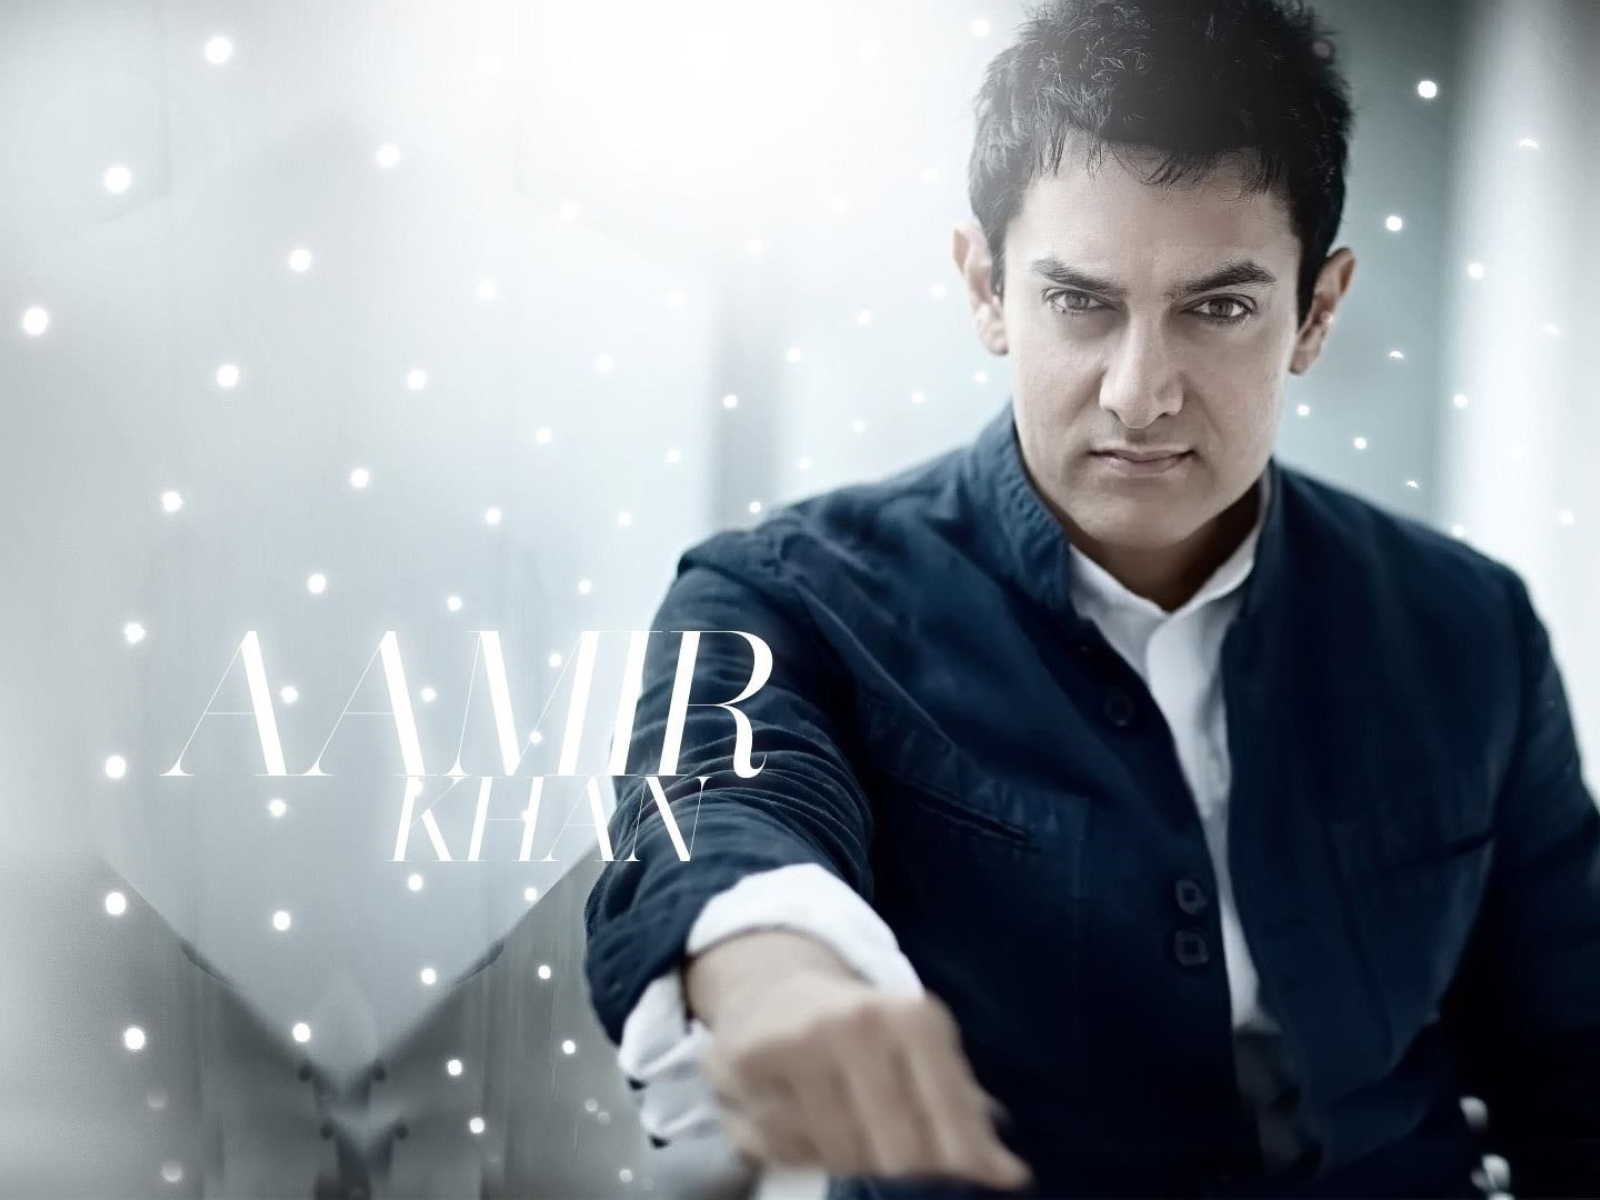 Aamir Khan Pic Download: Download Aamir Khan Latest Photoshoot 7680x4320 Resolution